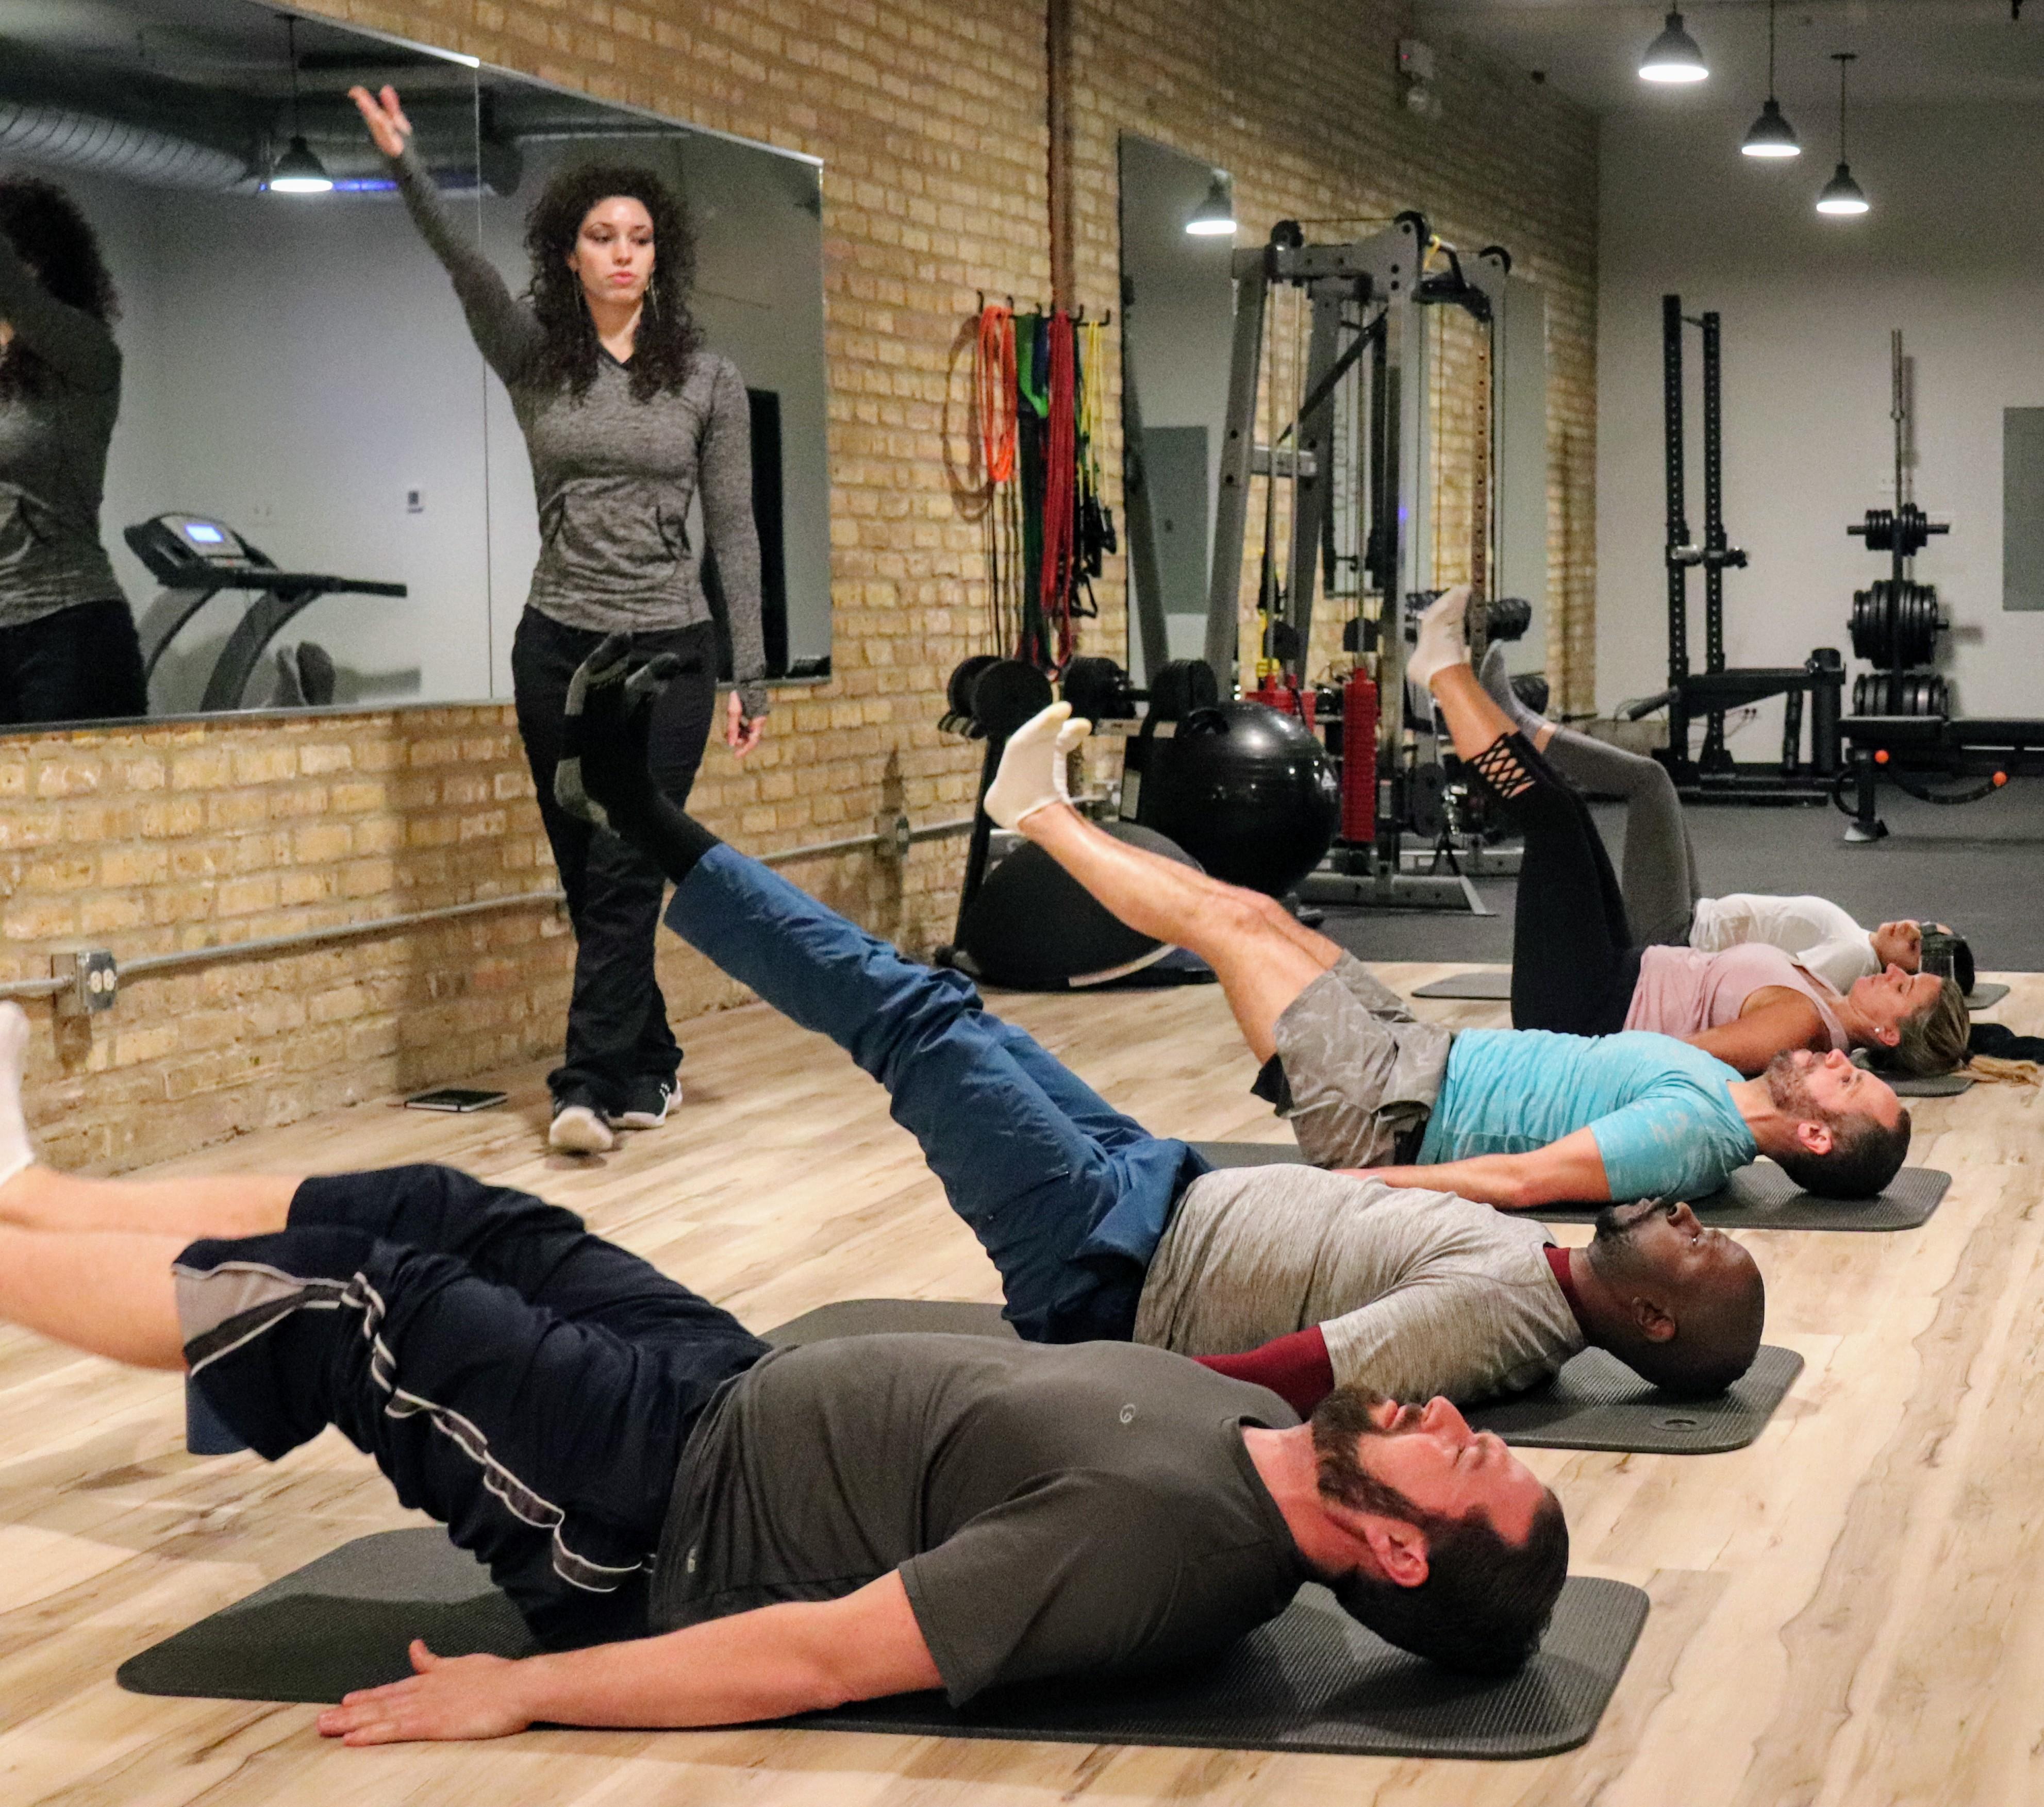 Mat Pilates class going through leg exercises